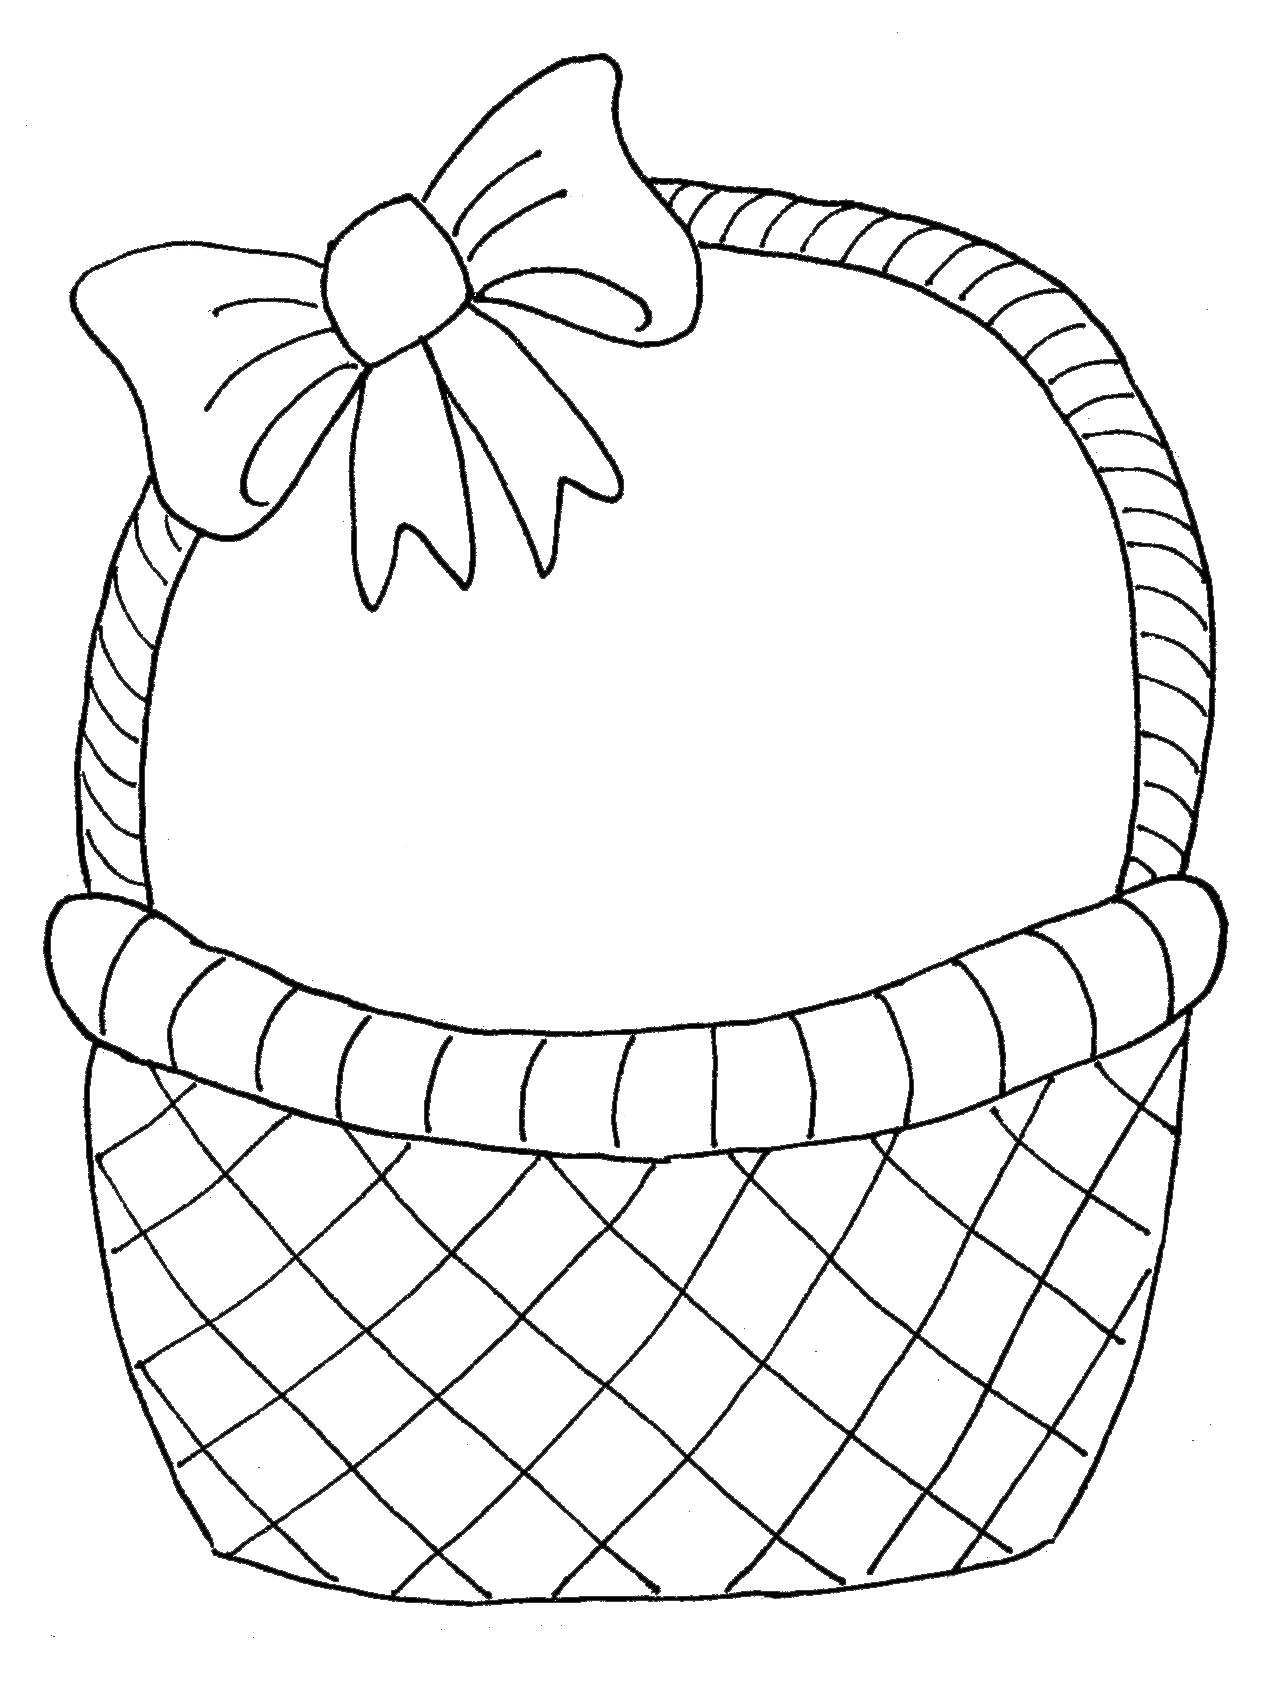 Flower Basket Line Drawing : Fruit basket drawing at getdrawings free for